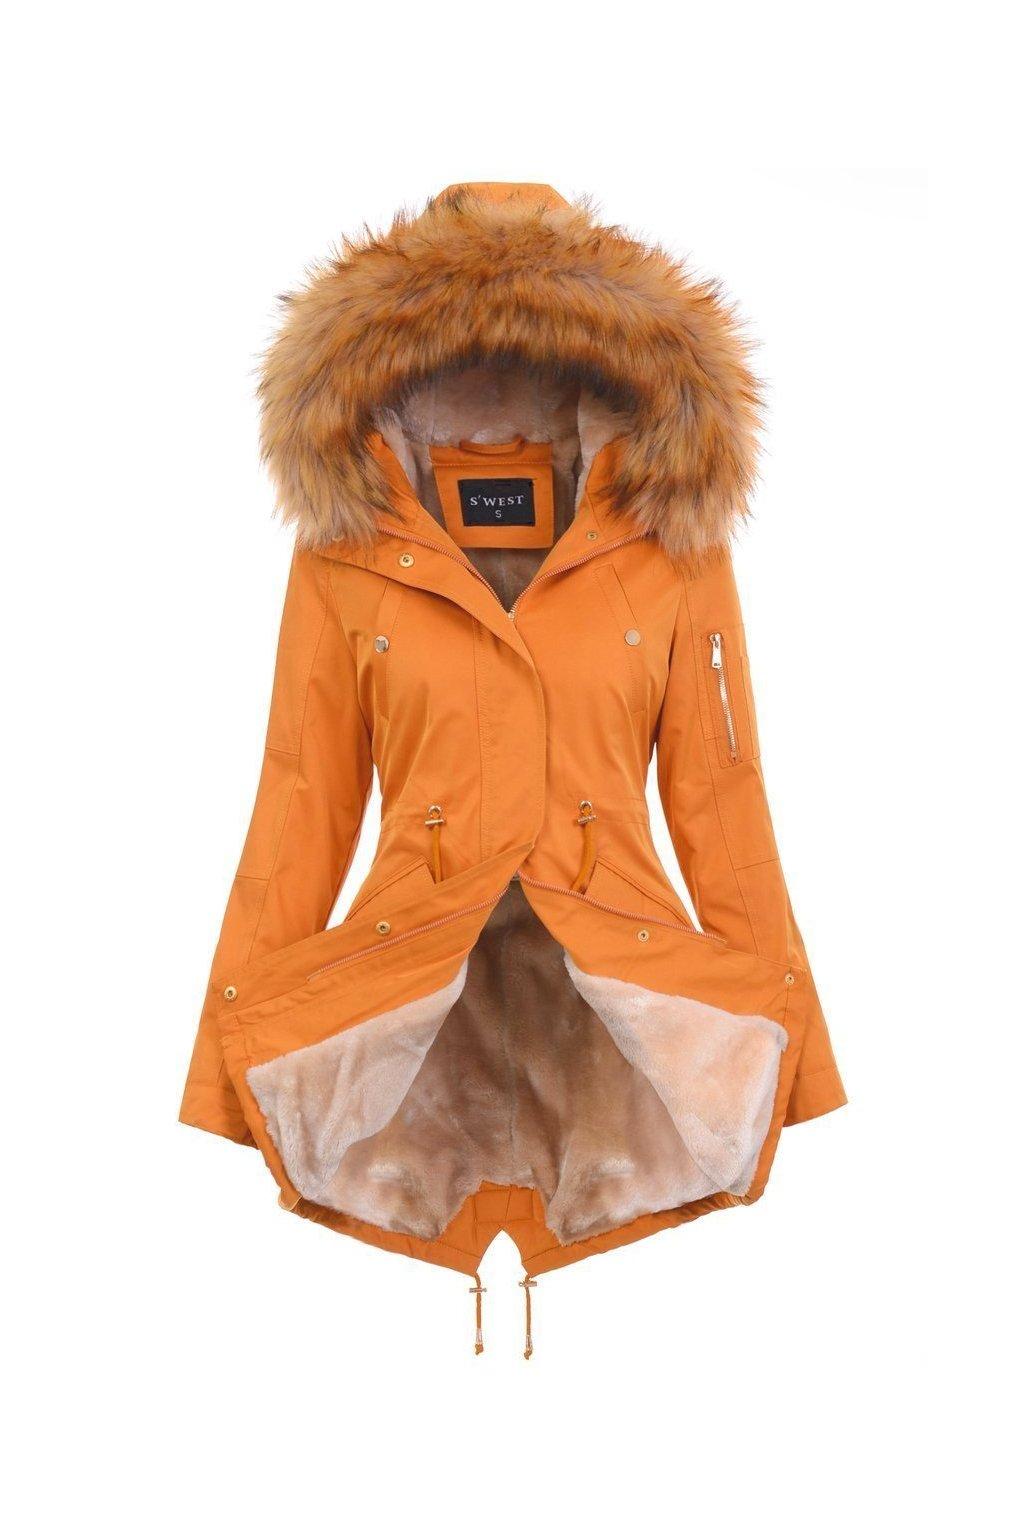 Dámska zimná bunda parka s kožušinou 4884 žltá